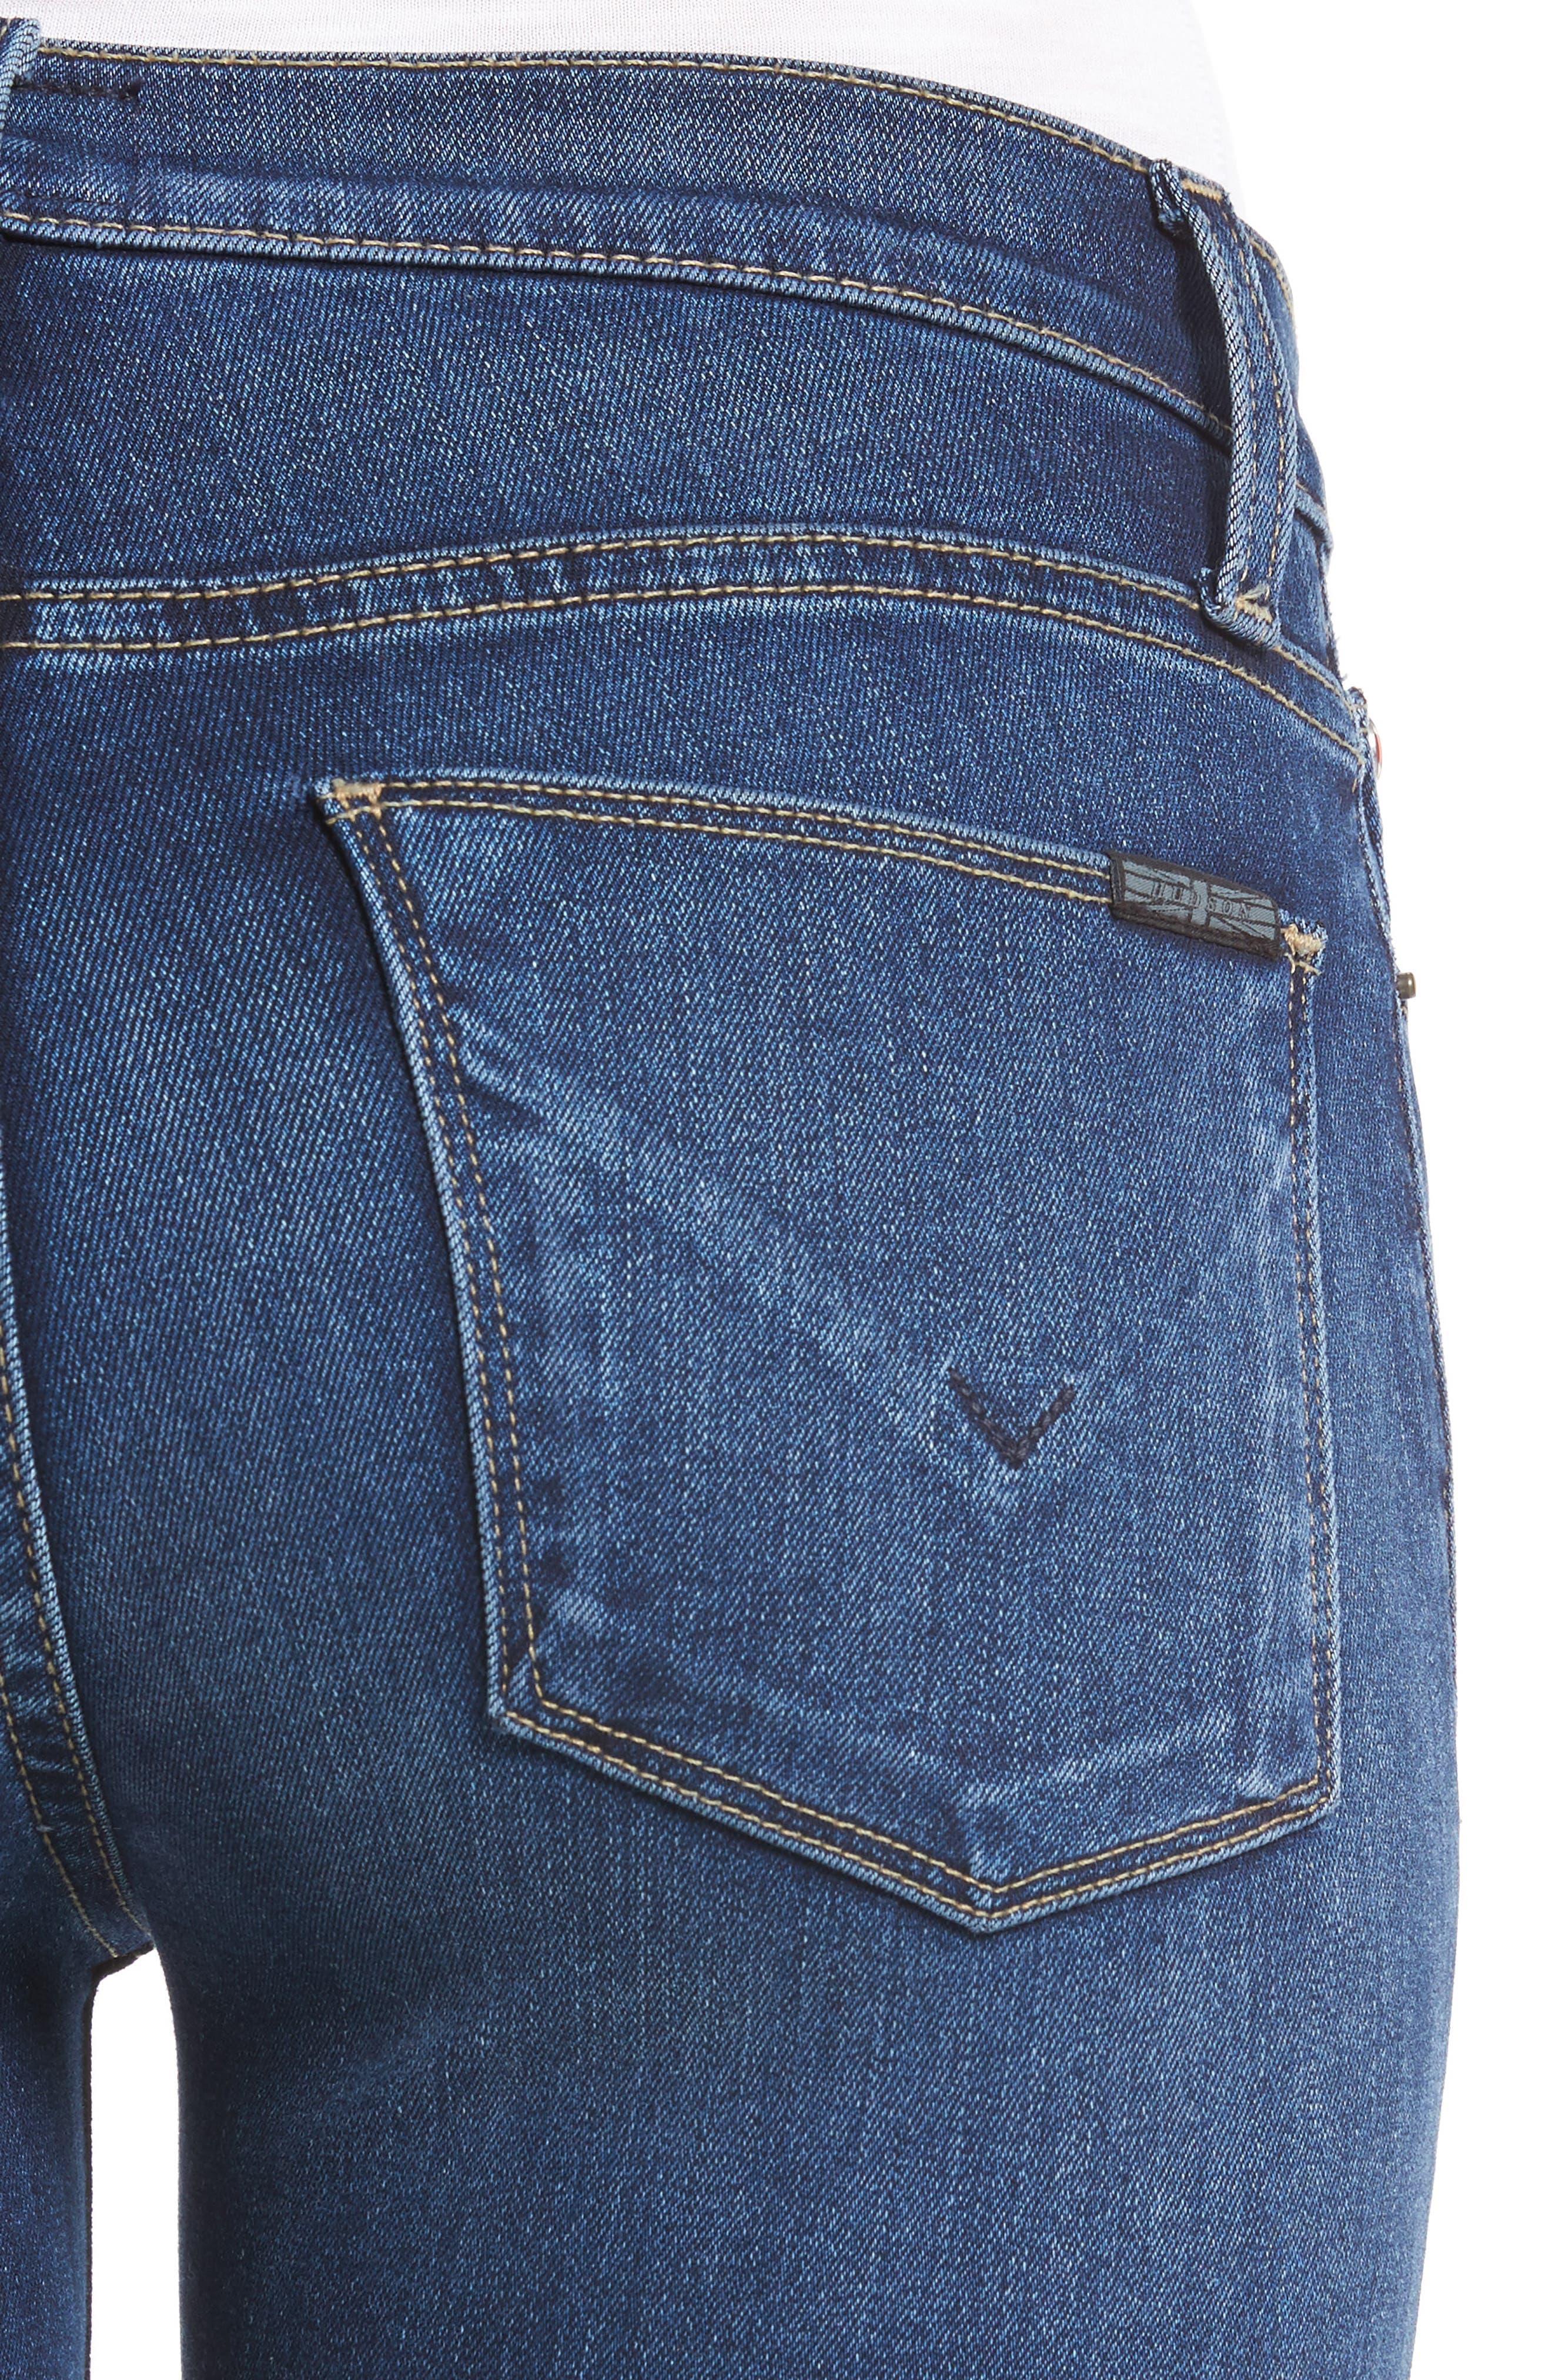 Alternate Image 4  - Hudson Jeans Colette Step Hem Skinny Jeans (Backbone)